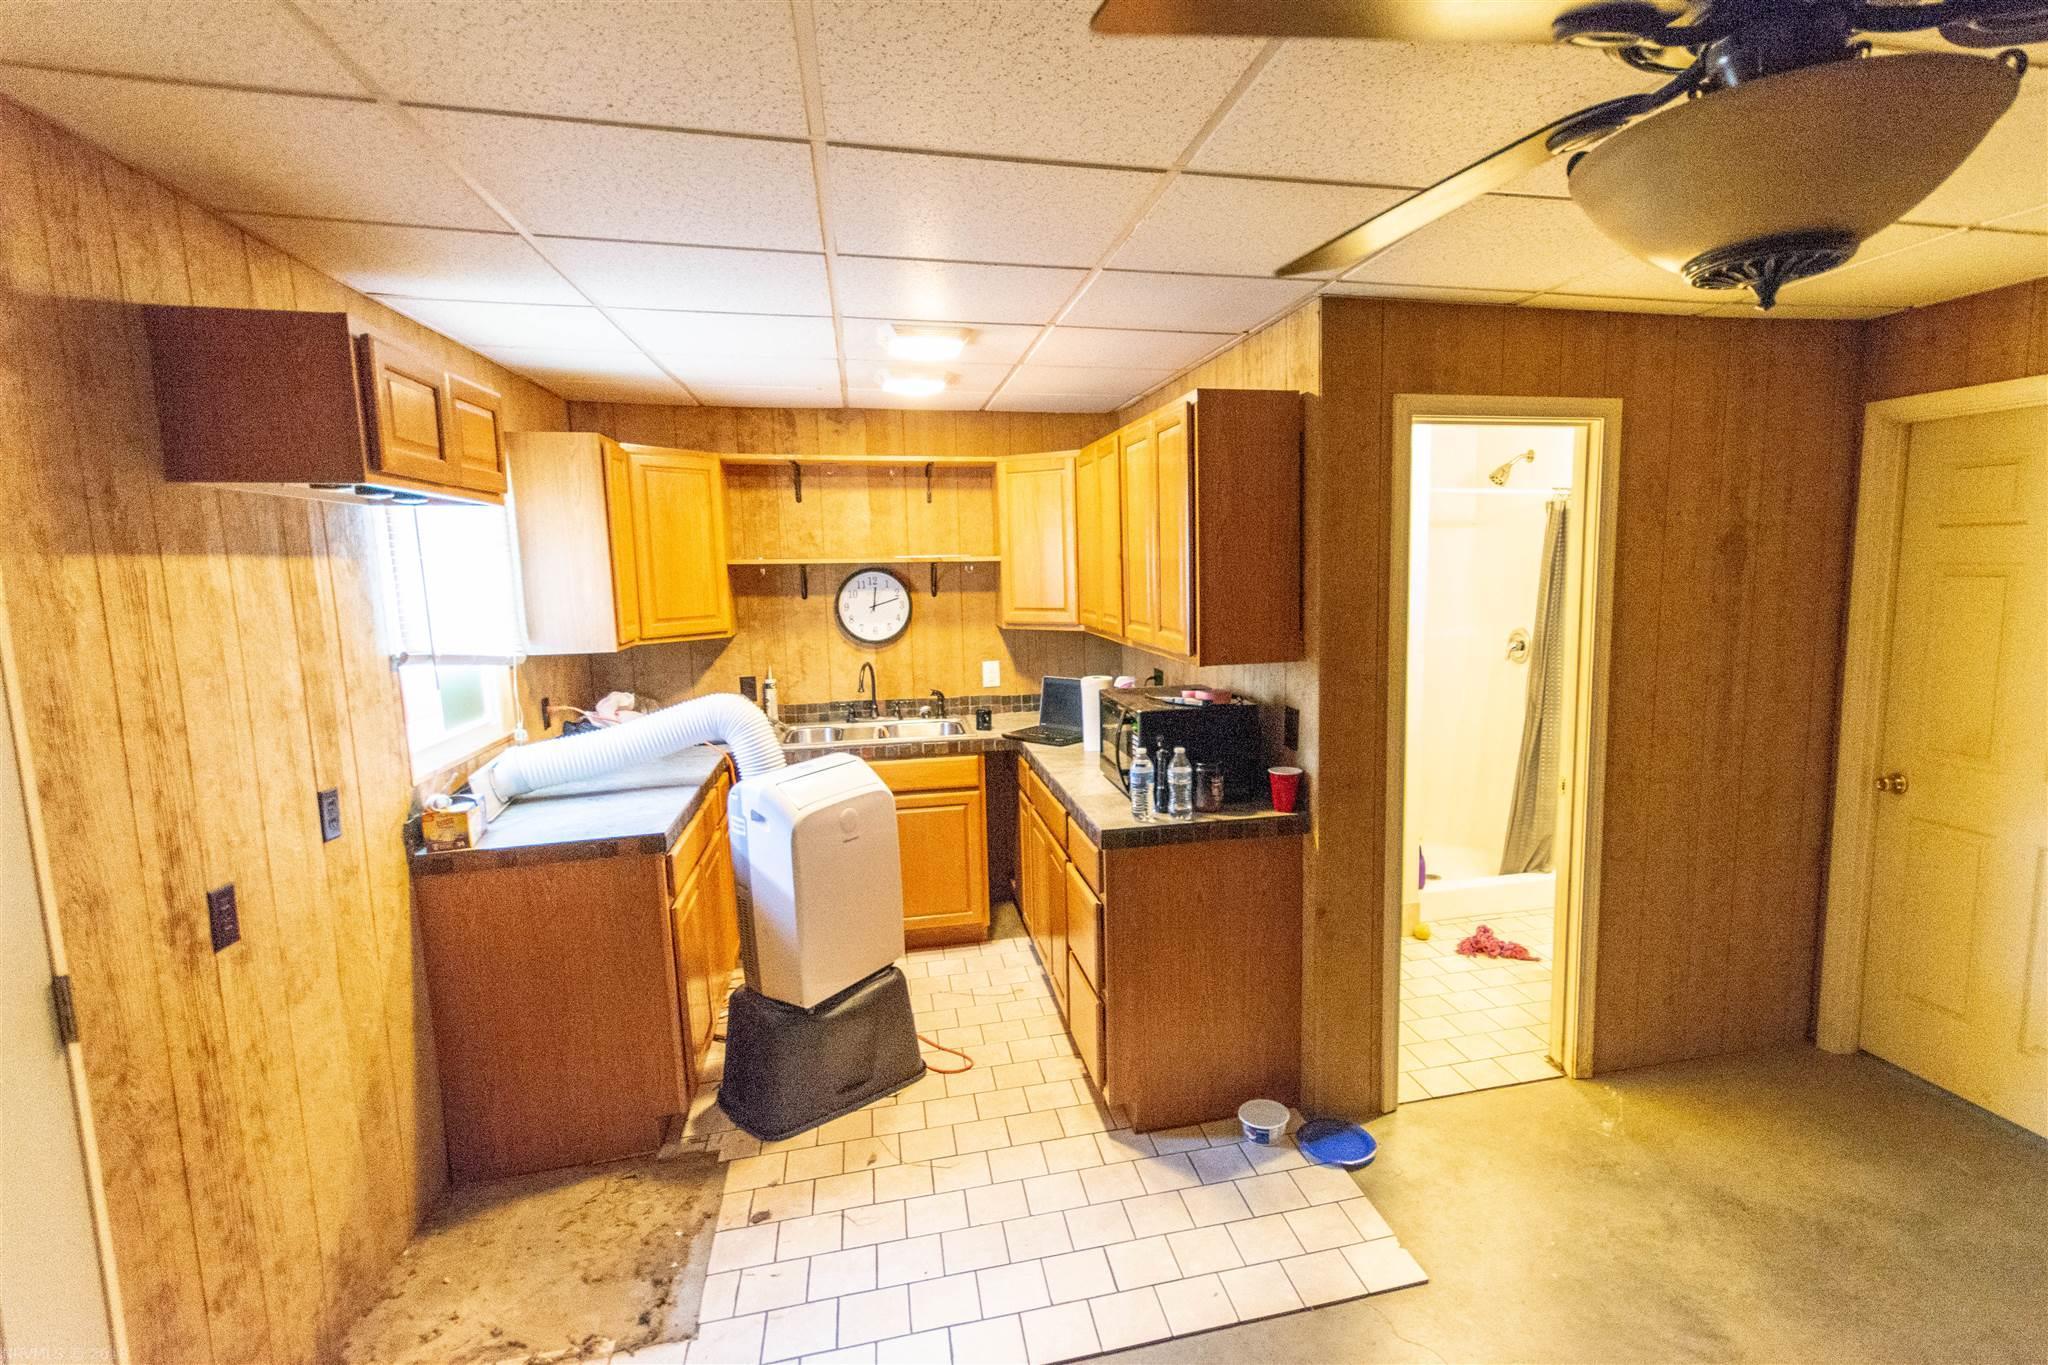 134 Edgewood, Crockett, VA, 24323